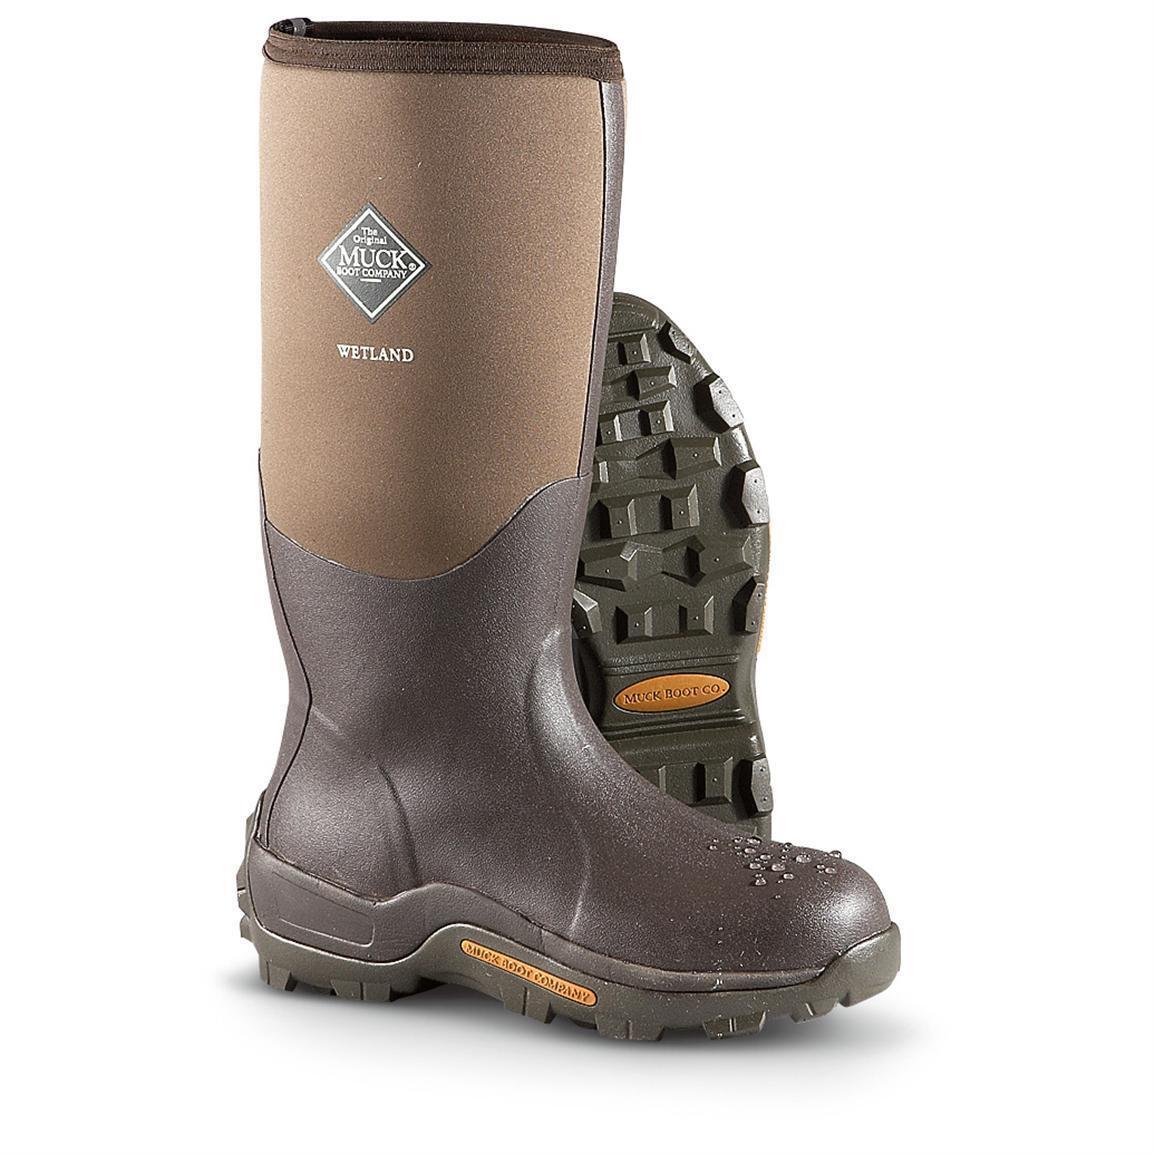 Muck Wetland Boots sizes 5-15 100% waterproof Tan/Bark WET-998K